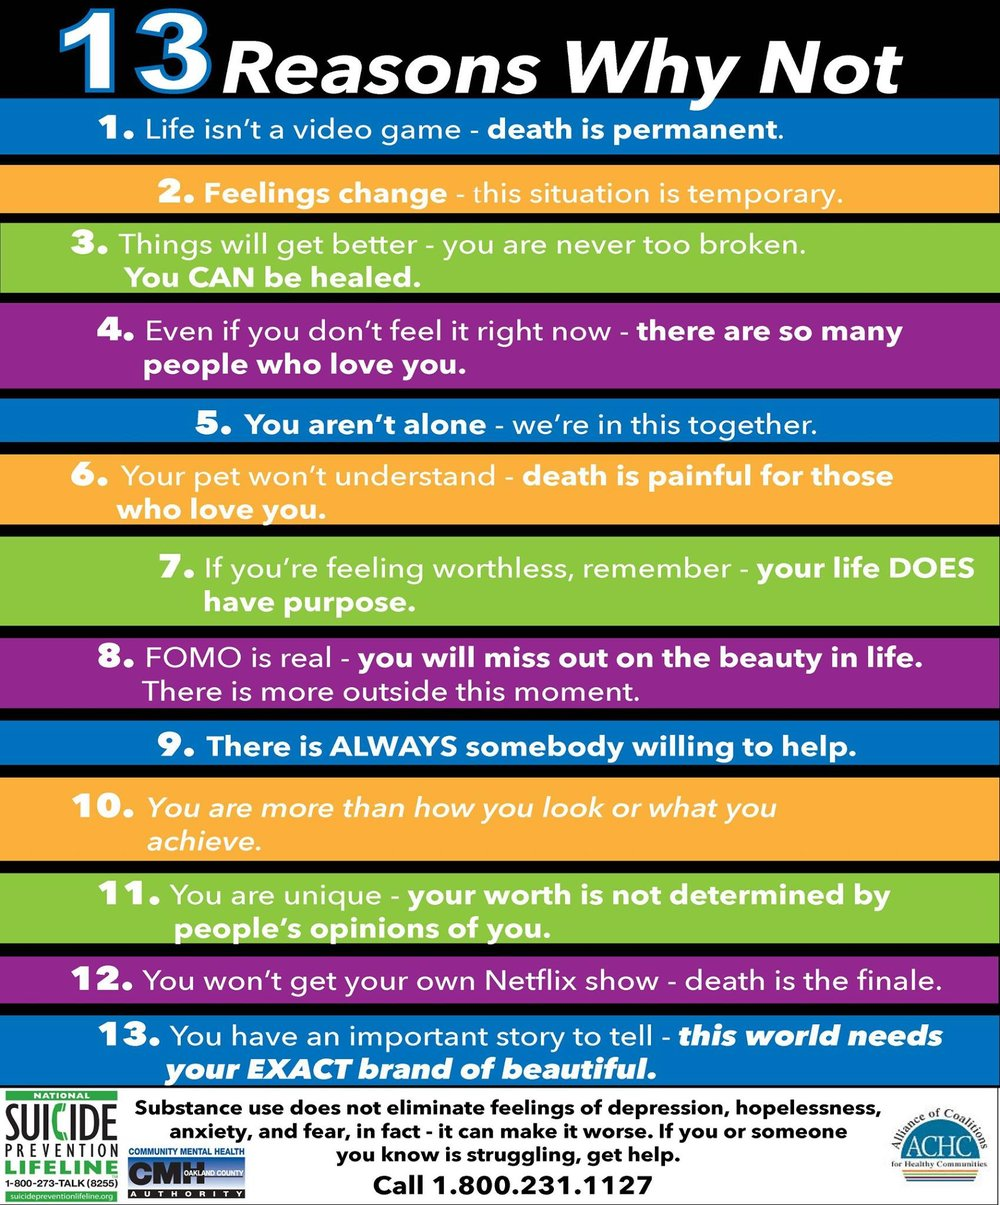 13 Reasons Why Not.jpg